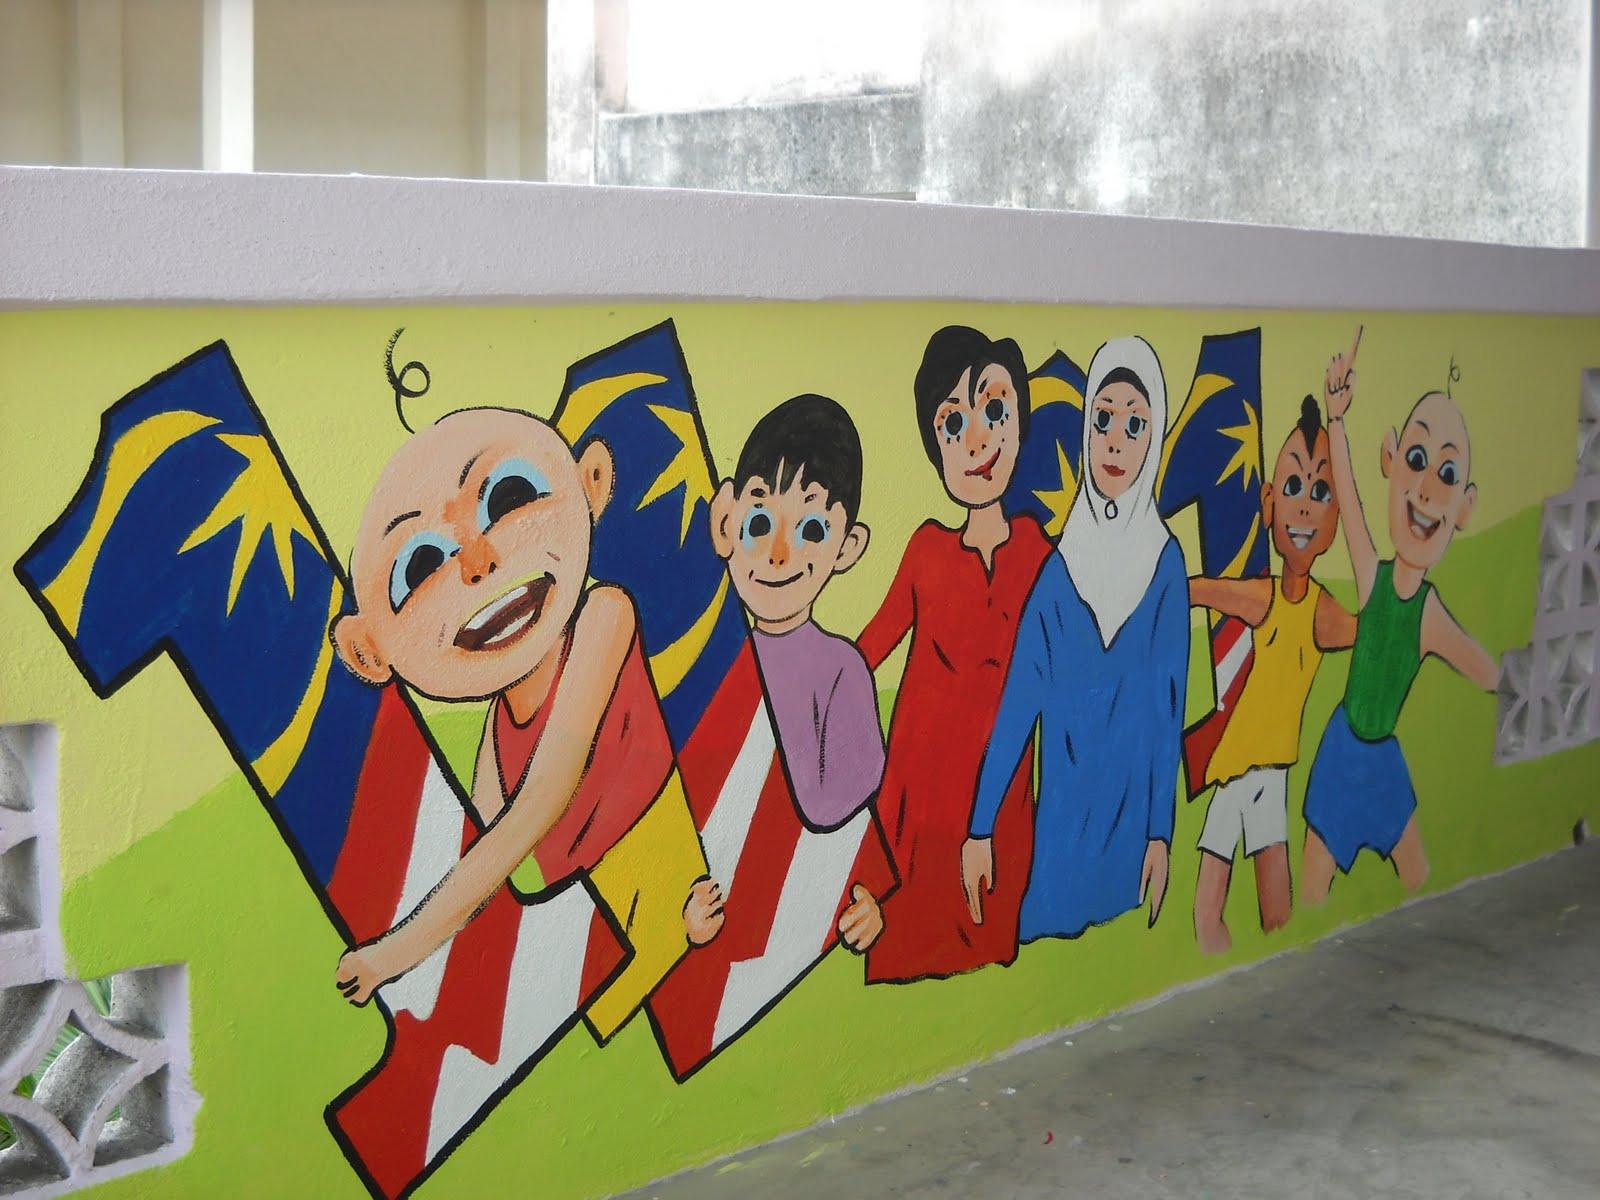 pelukis mural shah alam pelajar 1 malaysia